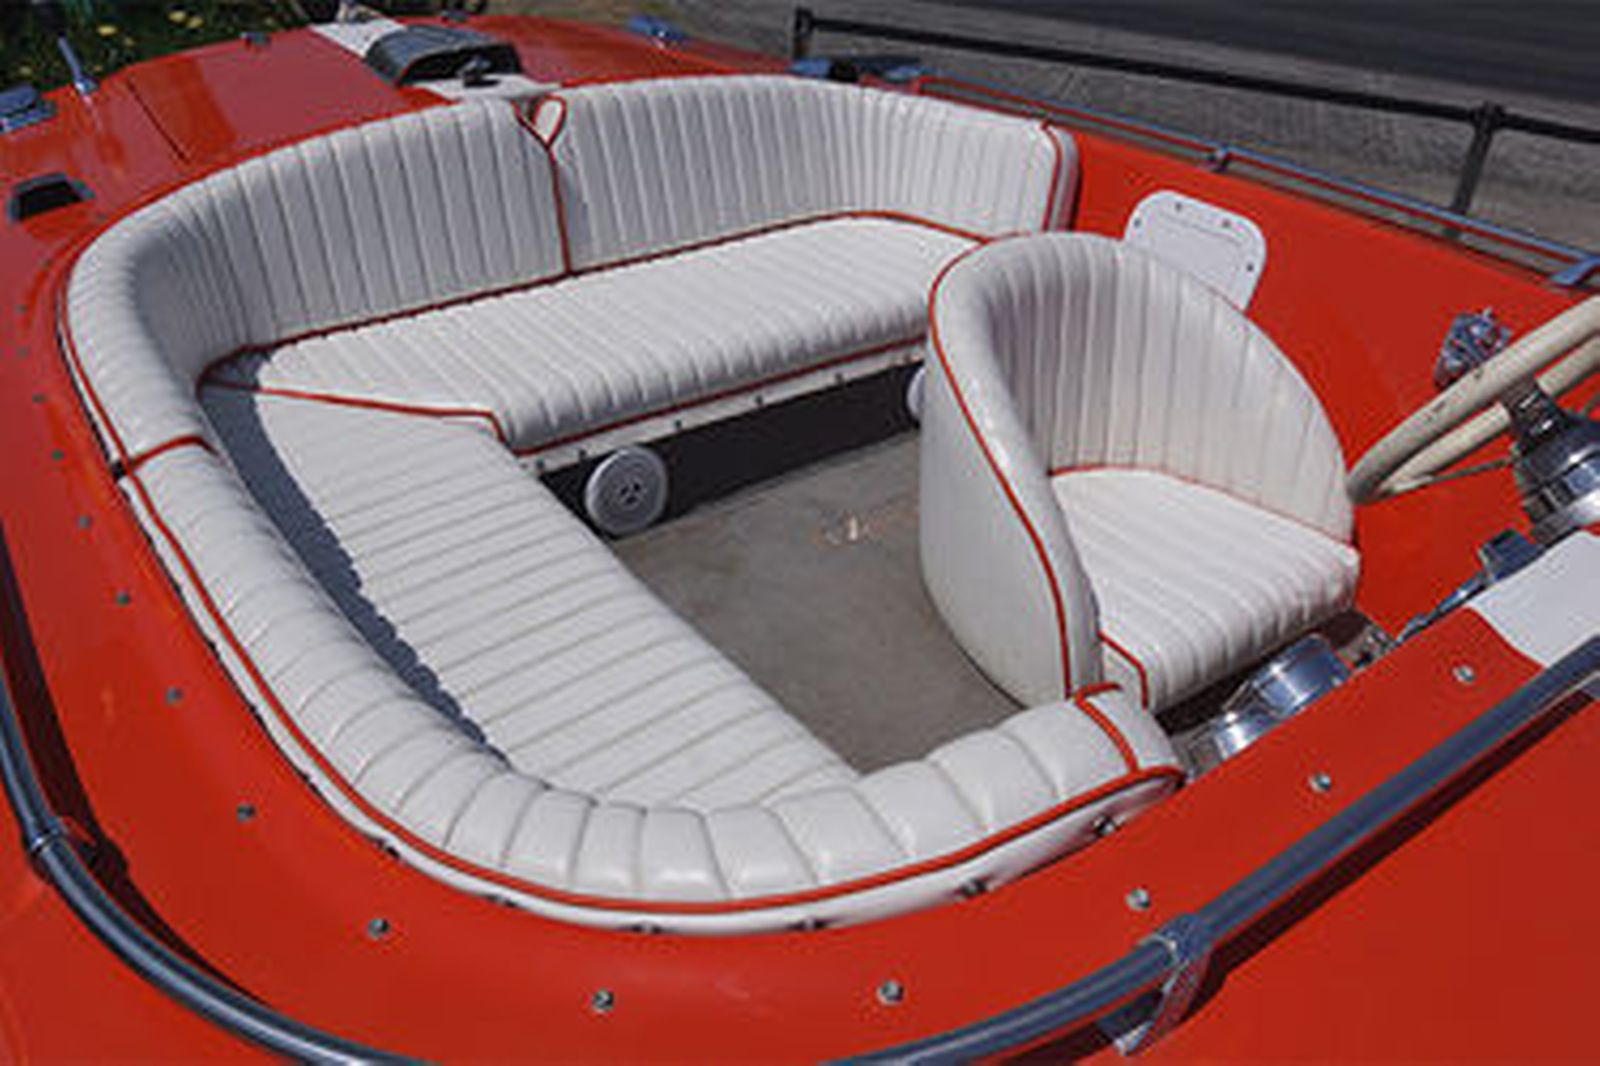 Donzi 'Sweet 16' Fibreglass Speed Boat on single axle trailer